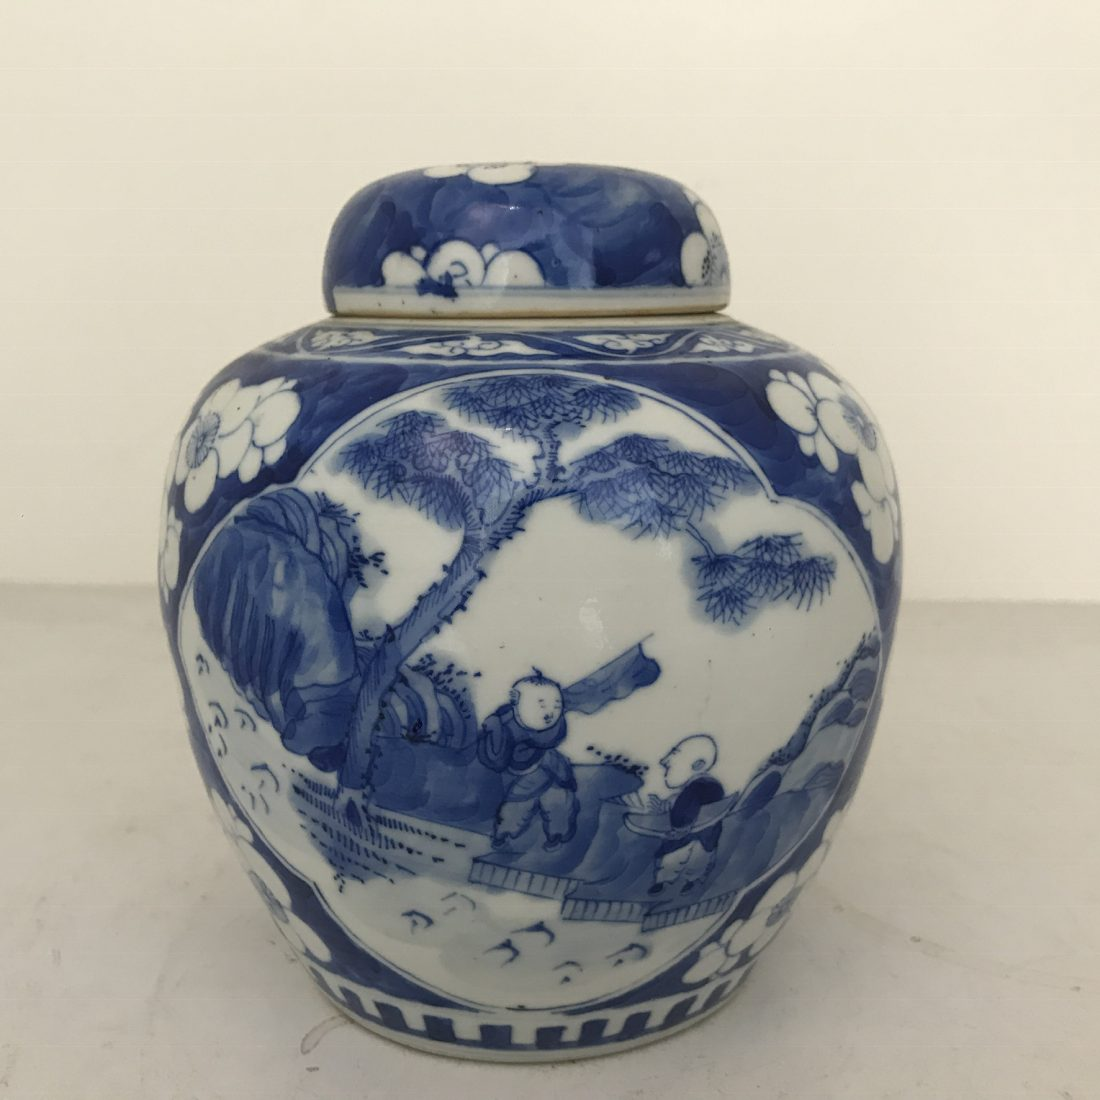 Blauw/wit porseleinen gemberpot met deksel, China, 19e eeuw